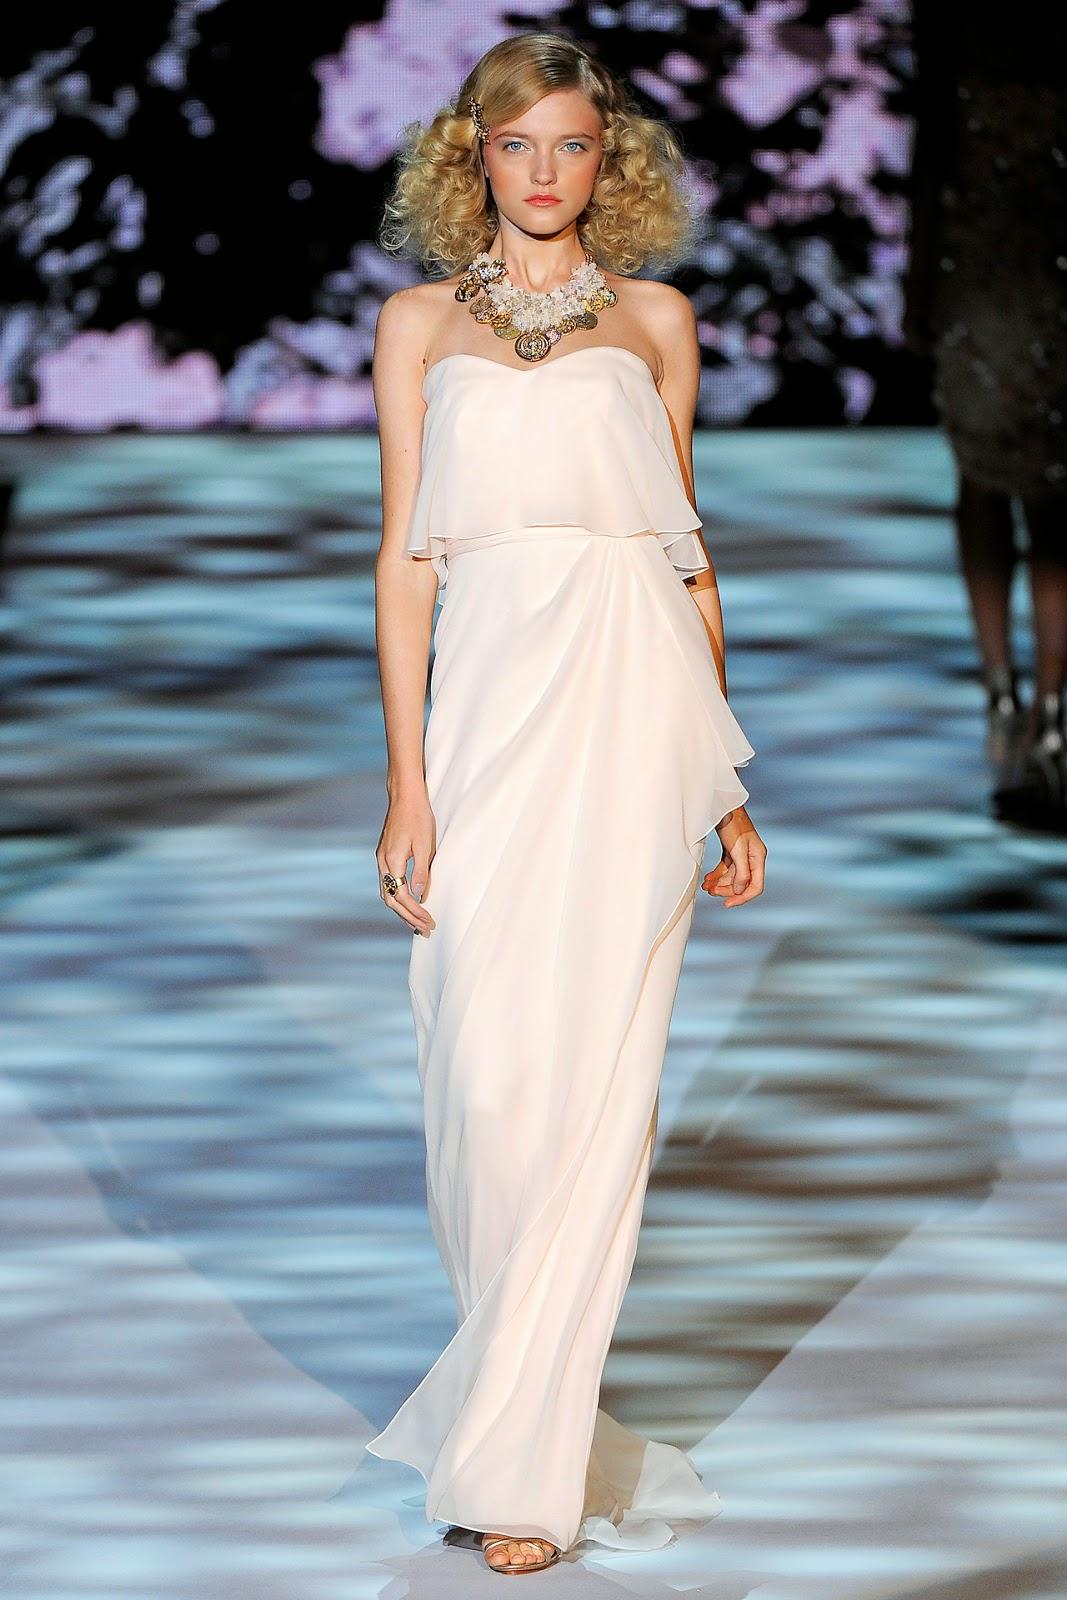 Wedding Talk: Bridesmaids Dresses - The Girl Next Shore